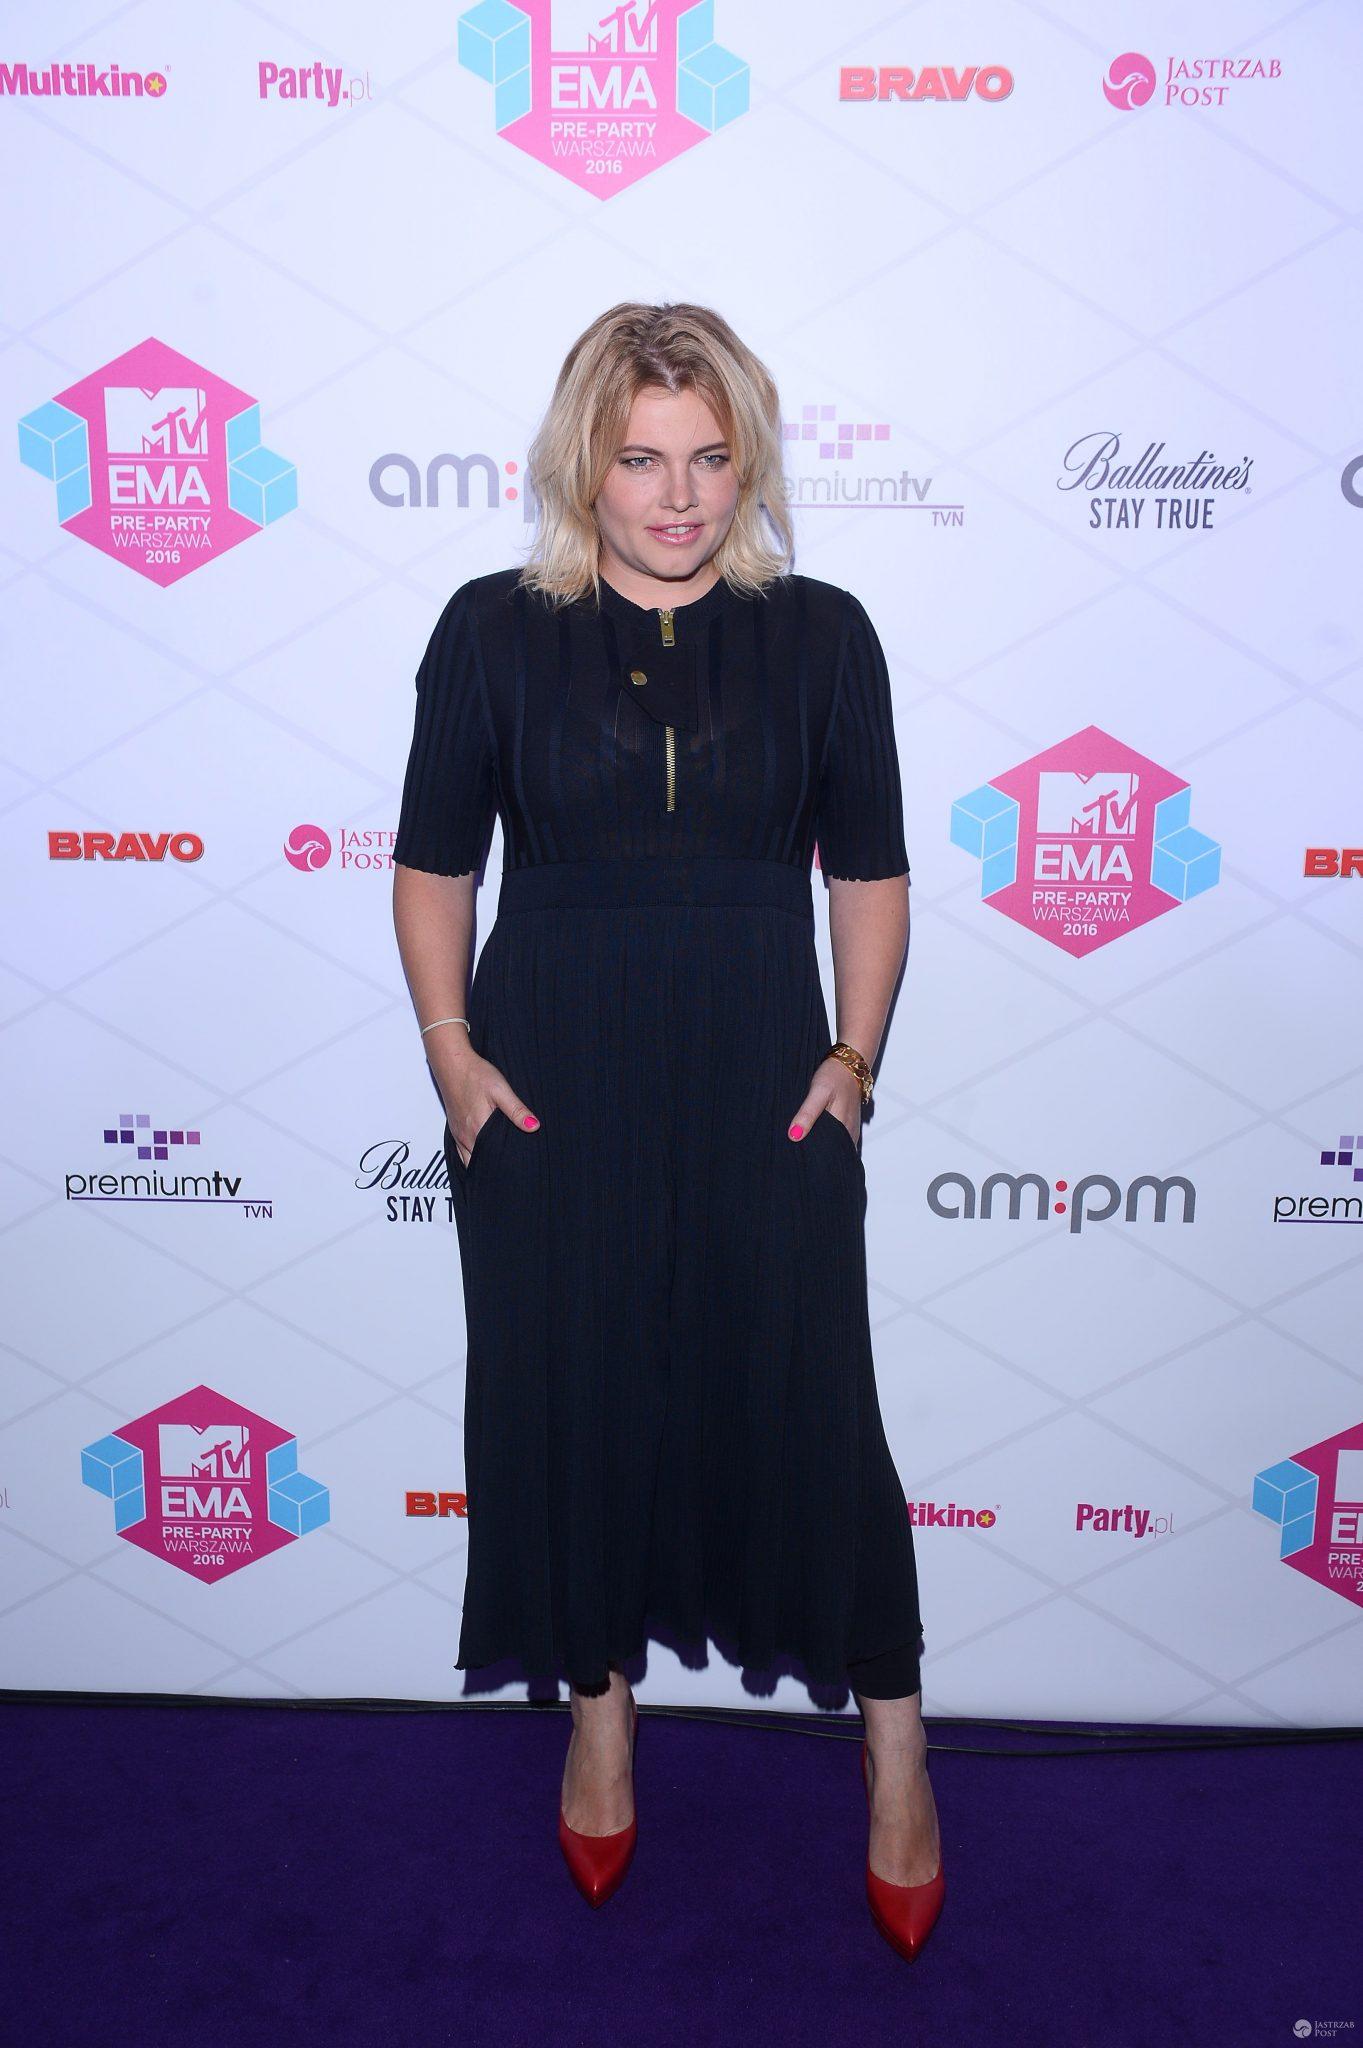 Ania Dąbrowska - MTV EMA PRE-PARTY 2016